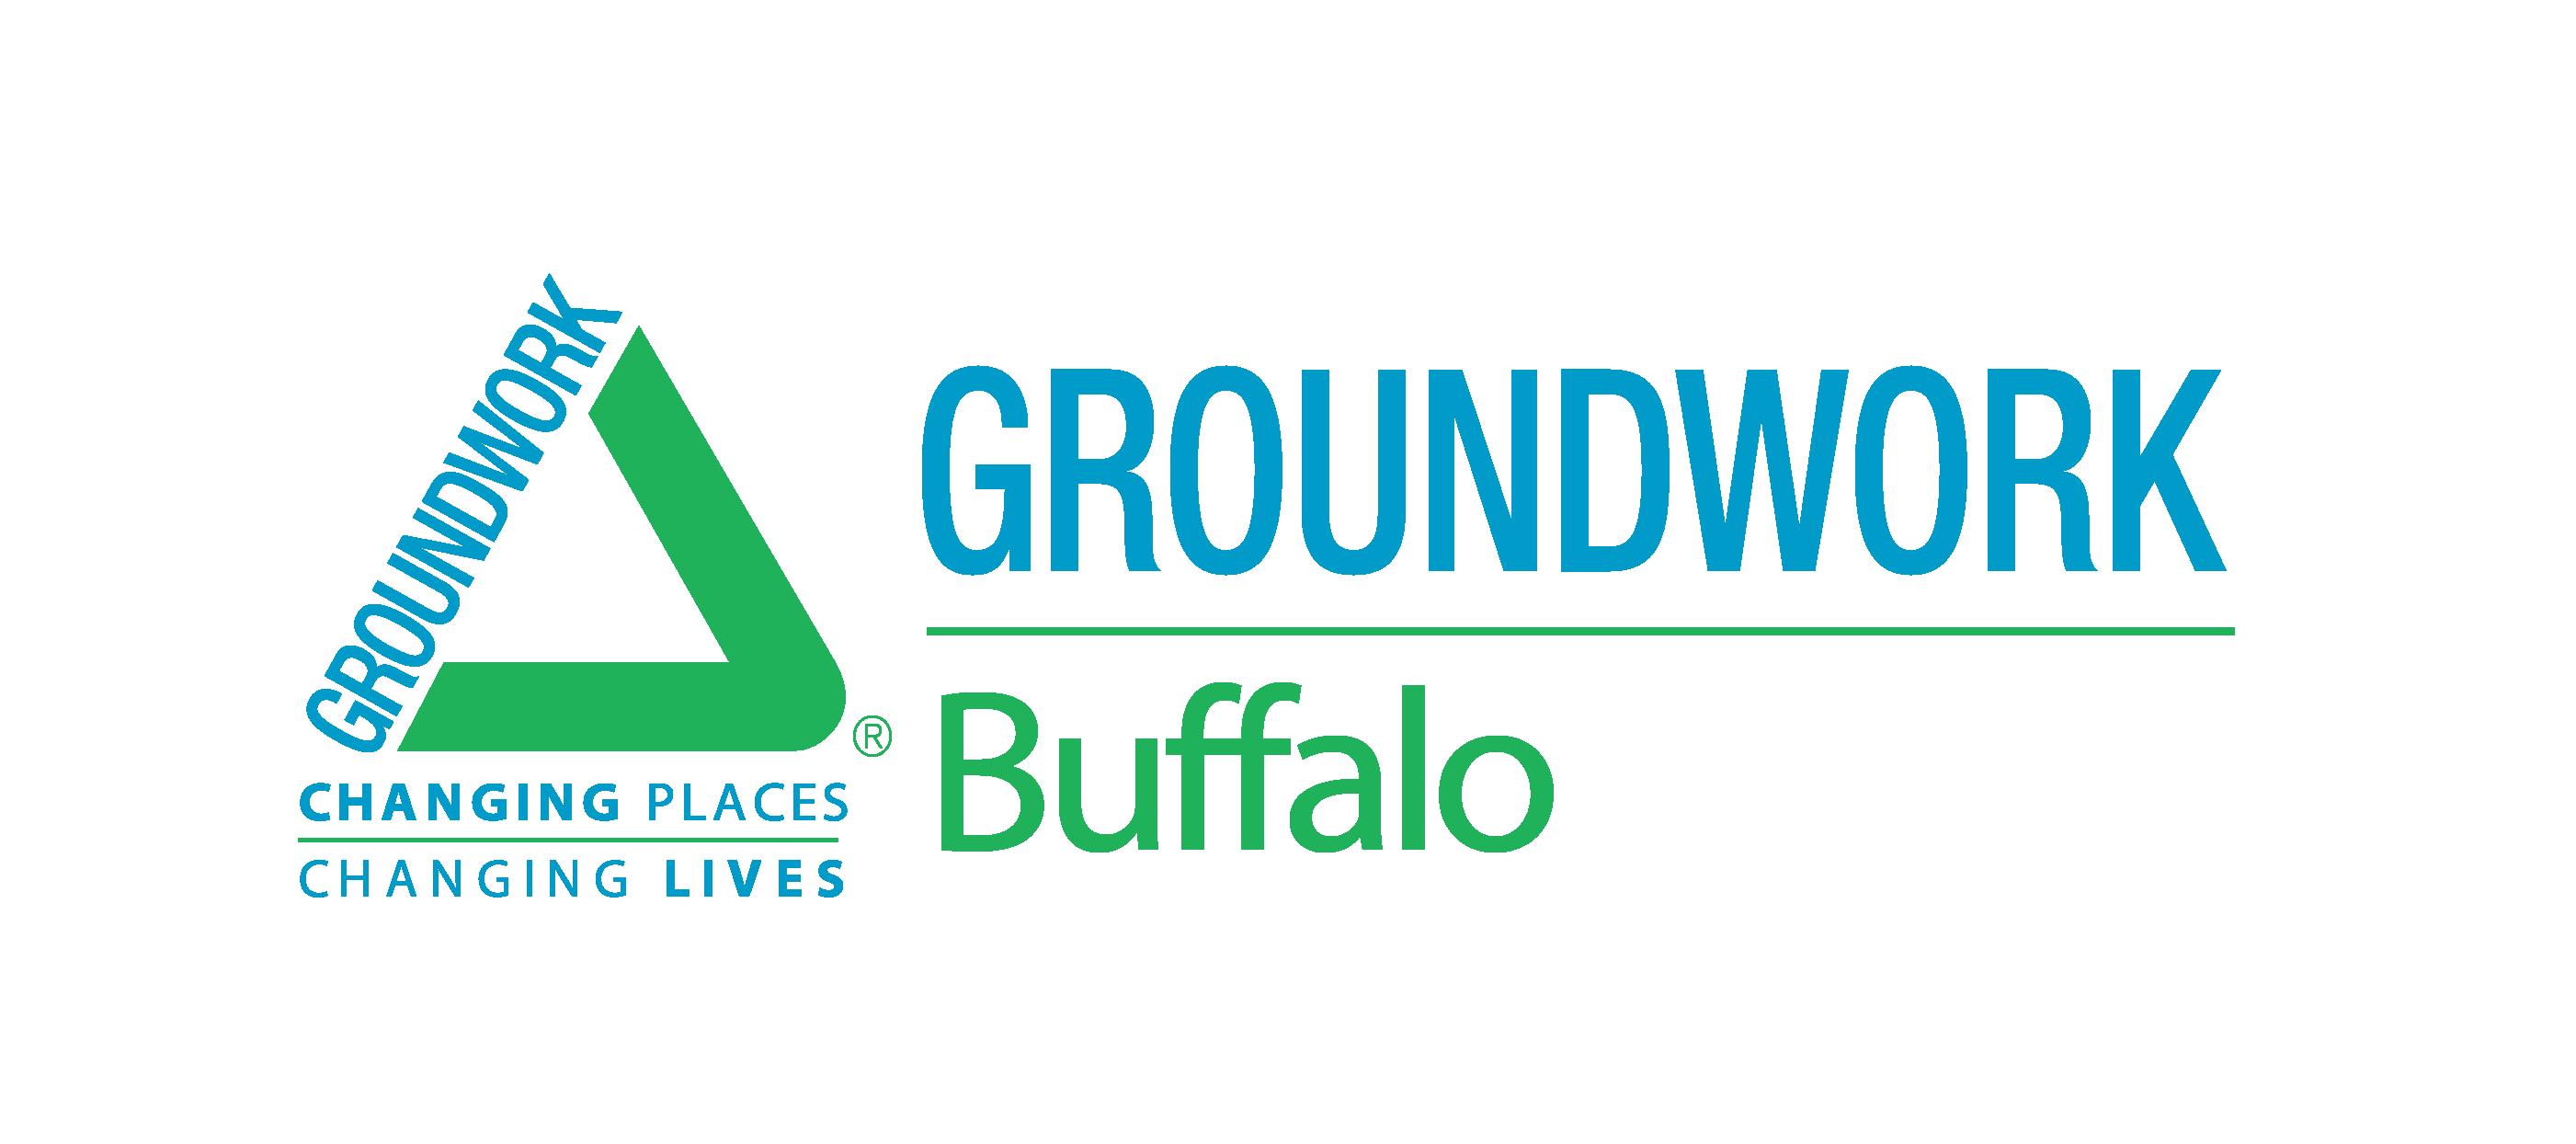 Groundwork Buffalo